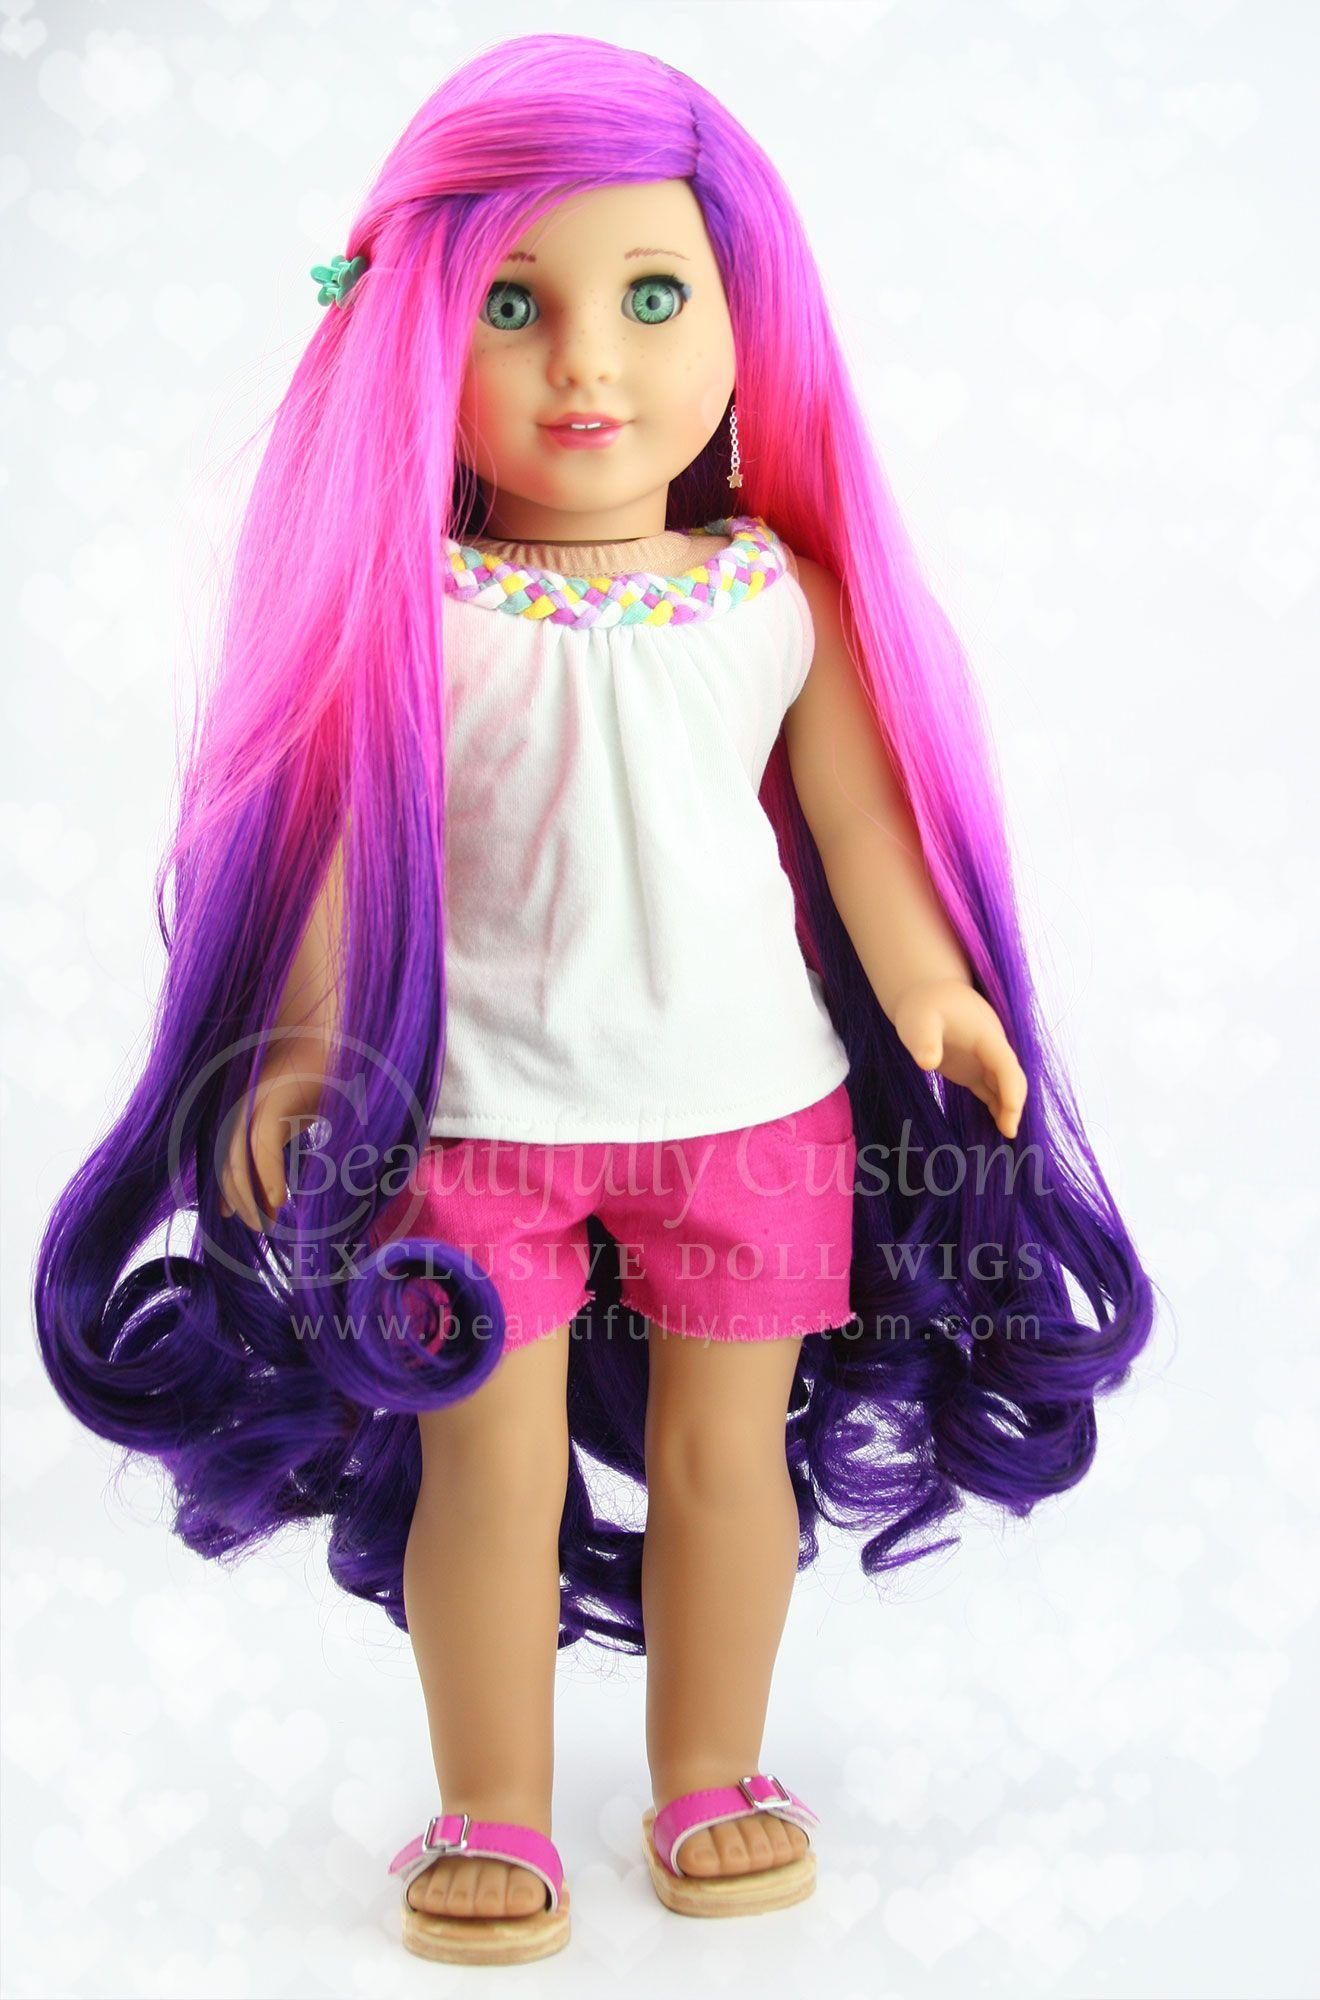 Violette Mermaid Doll Wig Pink Purple Ombre Hair for Custom